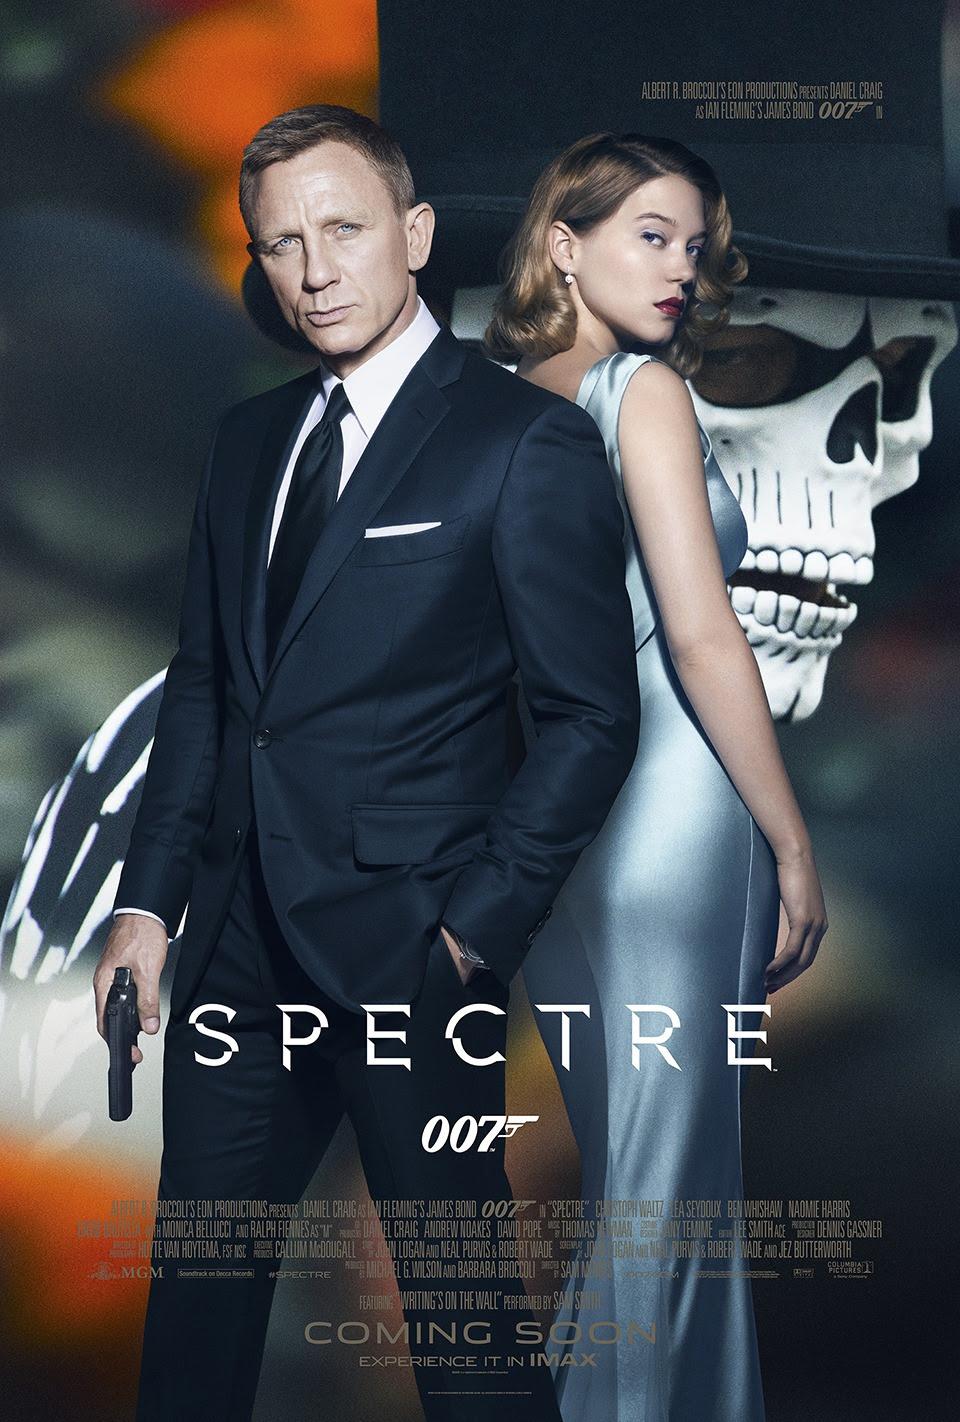 ĐIỆP VIÊN 007: BÓNG MA SPECTRE Bond 24: Spectre (2015)